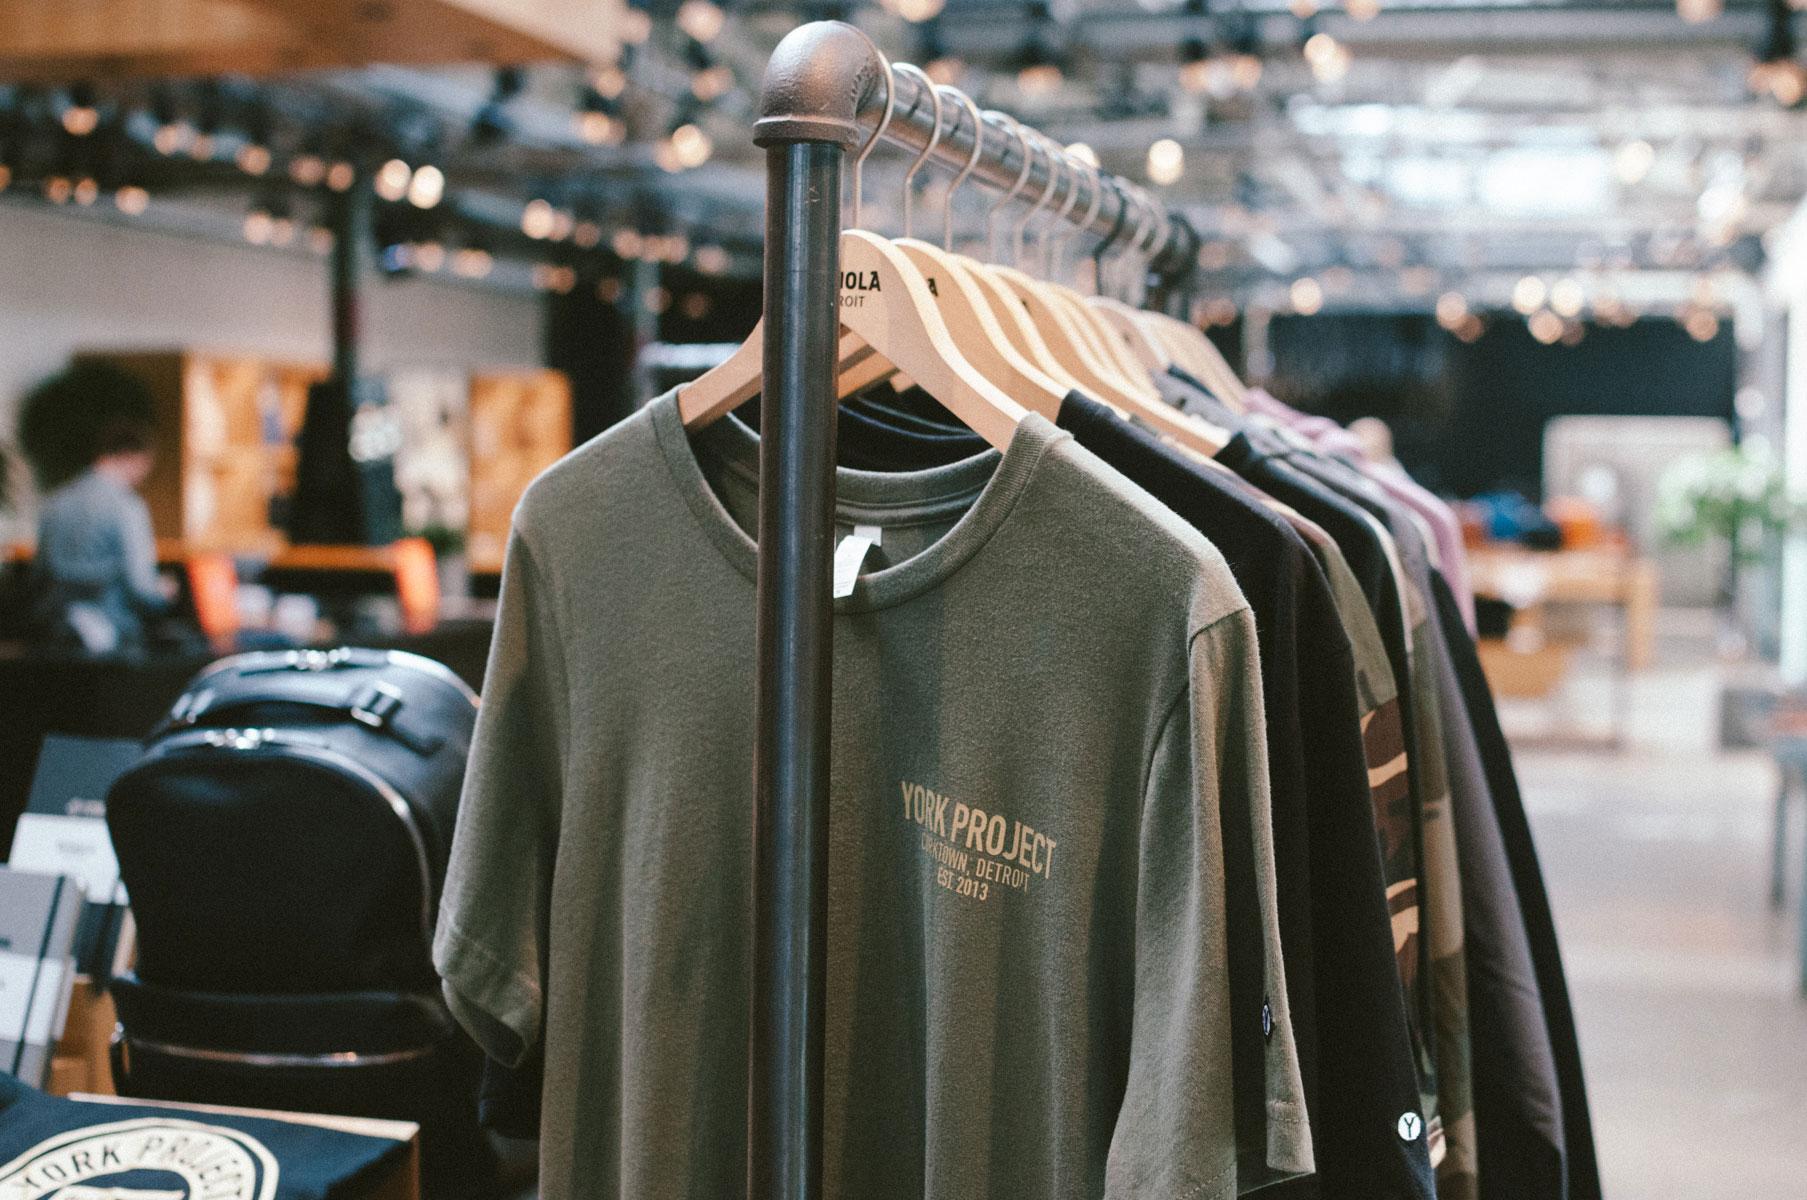 shinola shirts rack 2.jpg